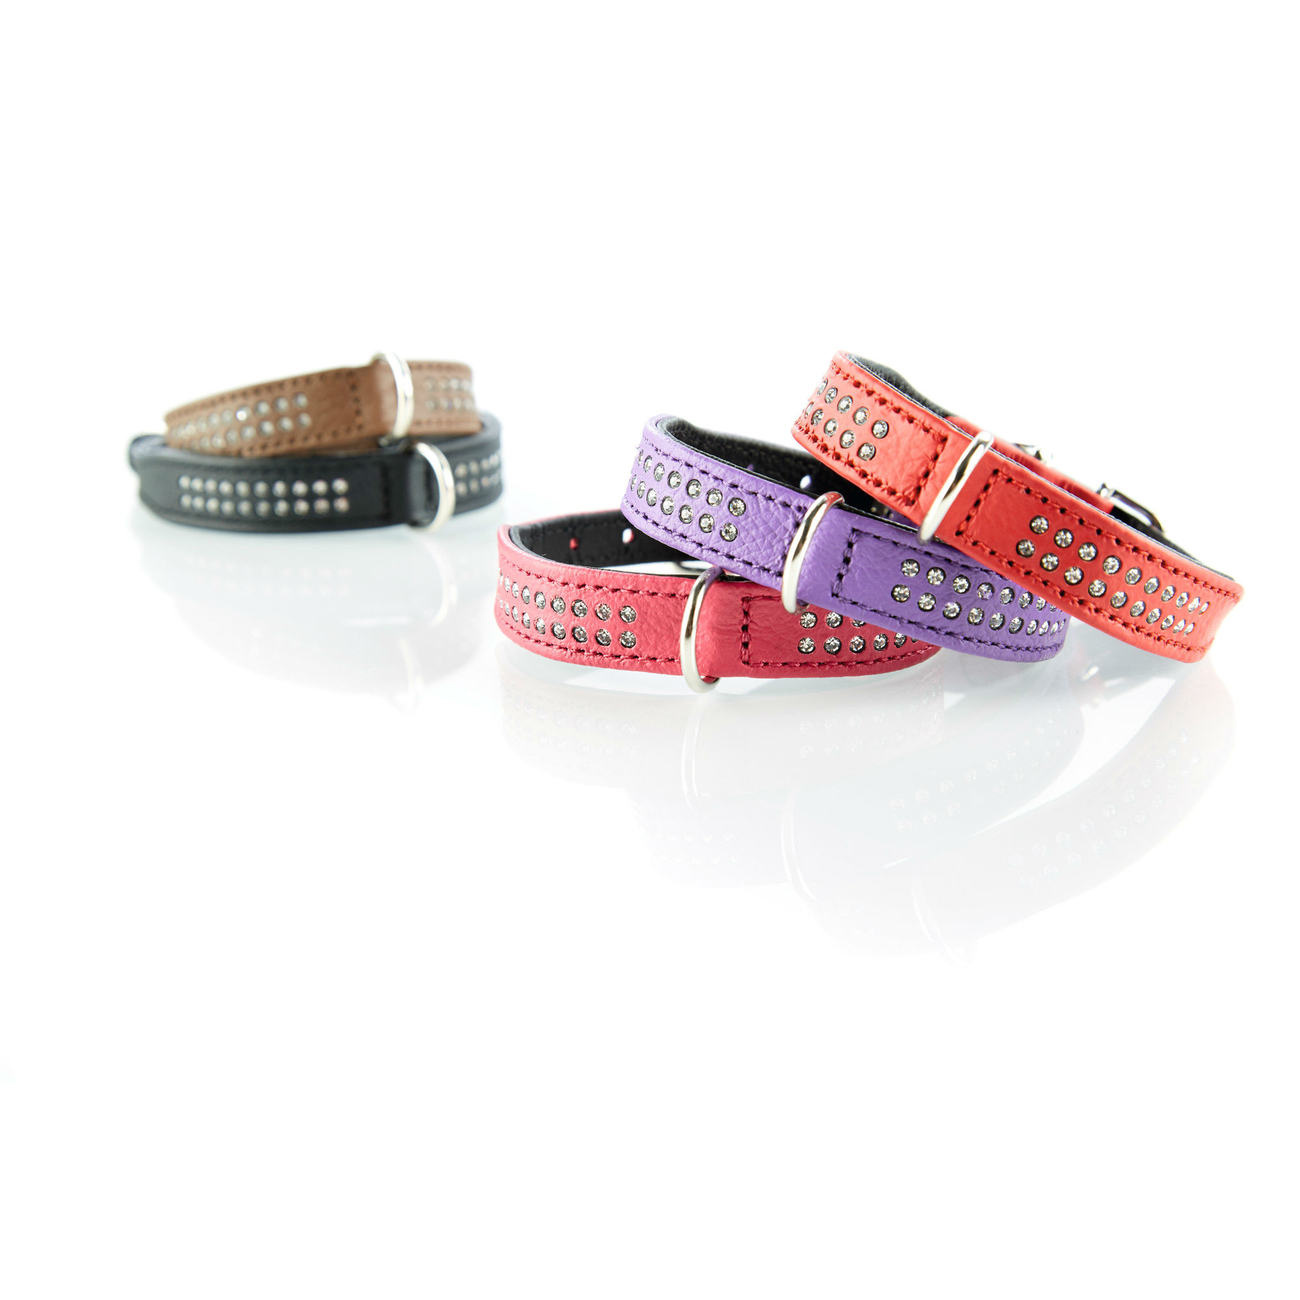 Hunter Halsband Swarowski Diamond Petit für kleine Hunde 47724, Bild 4